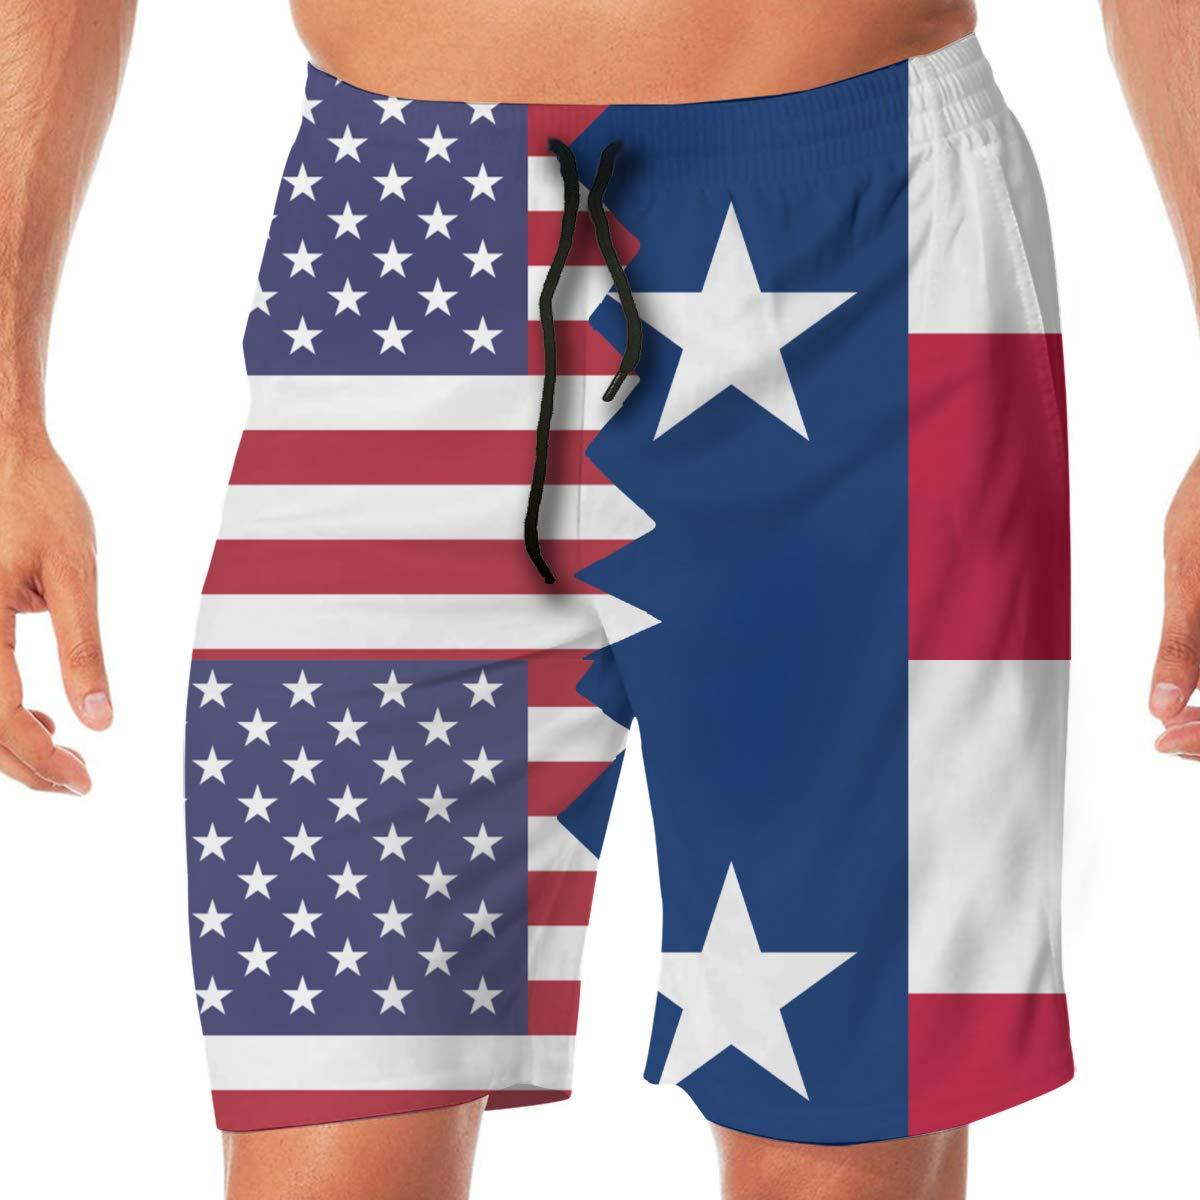 YGE.I.L25 Men Athletic Shorts American Texas Flag Lightweight Beach Board Short Adults Boys